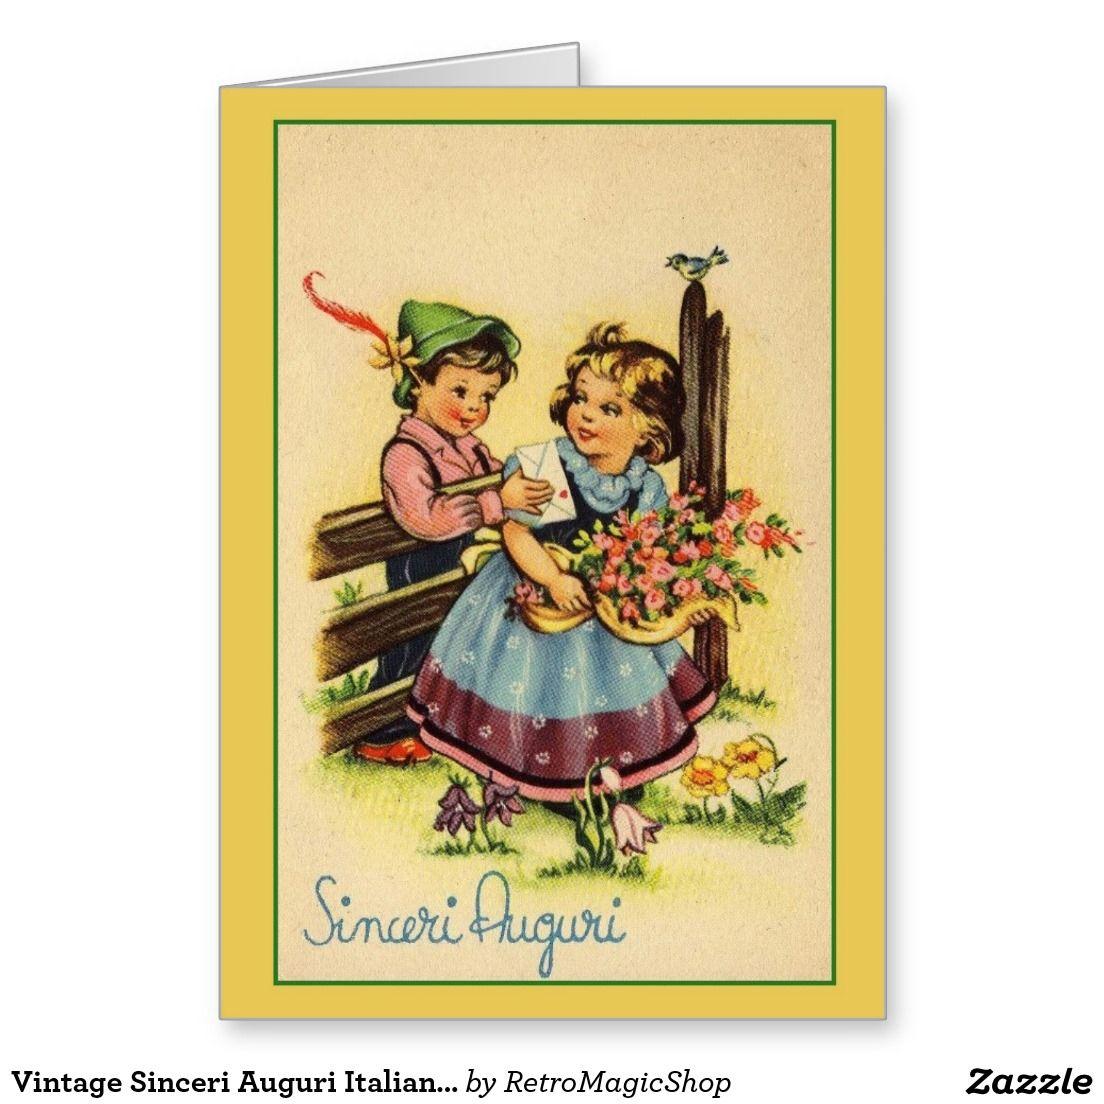 Vintage Sinceri Auguri Italian Birthday Card – Italian Birthday Card